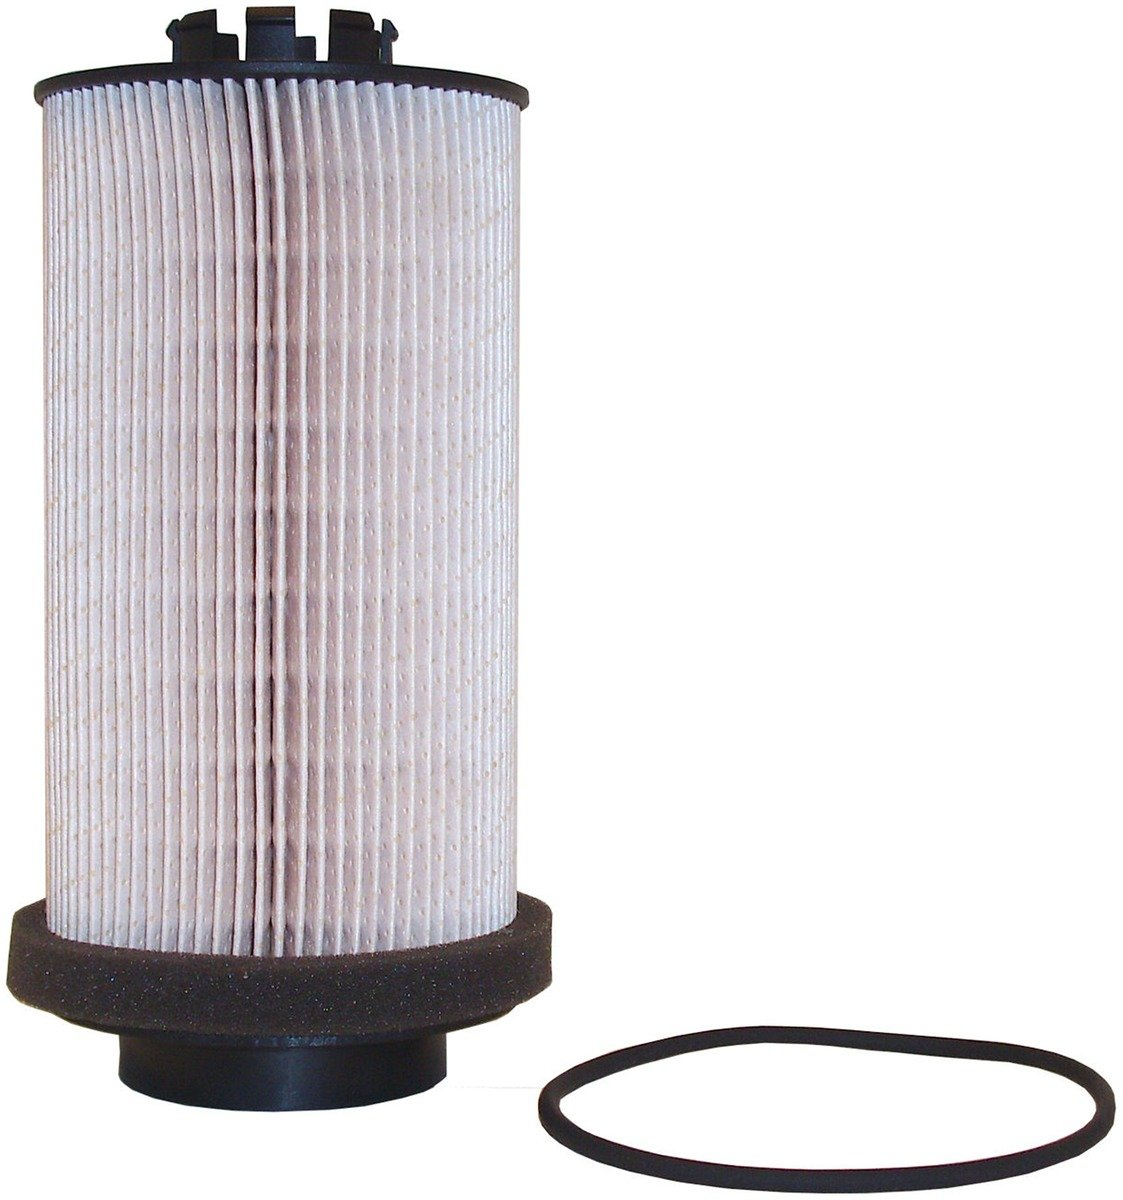 Luber-finer L8994F Heavy Duty Fuel Filter